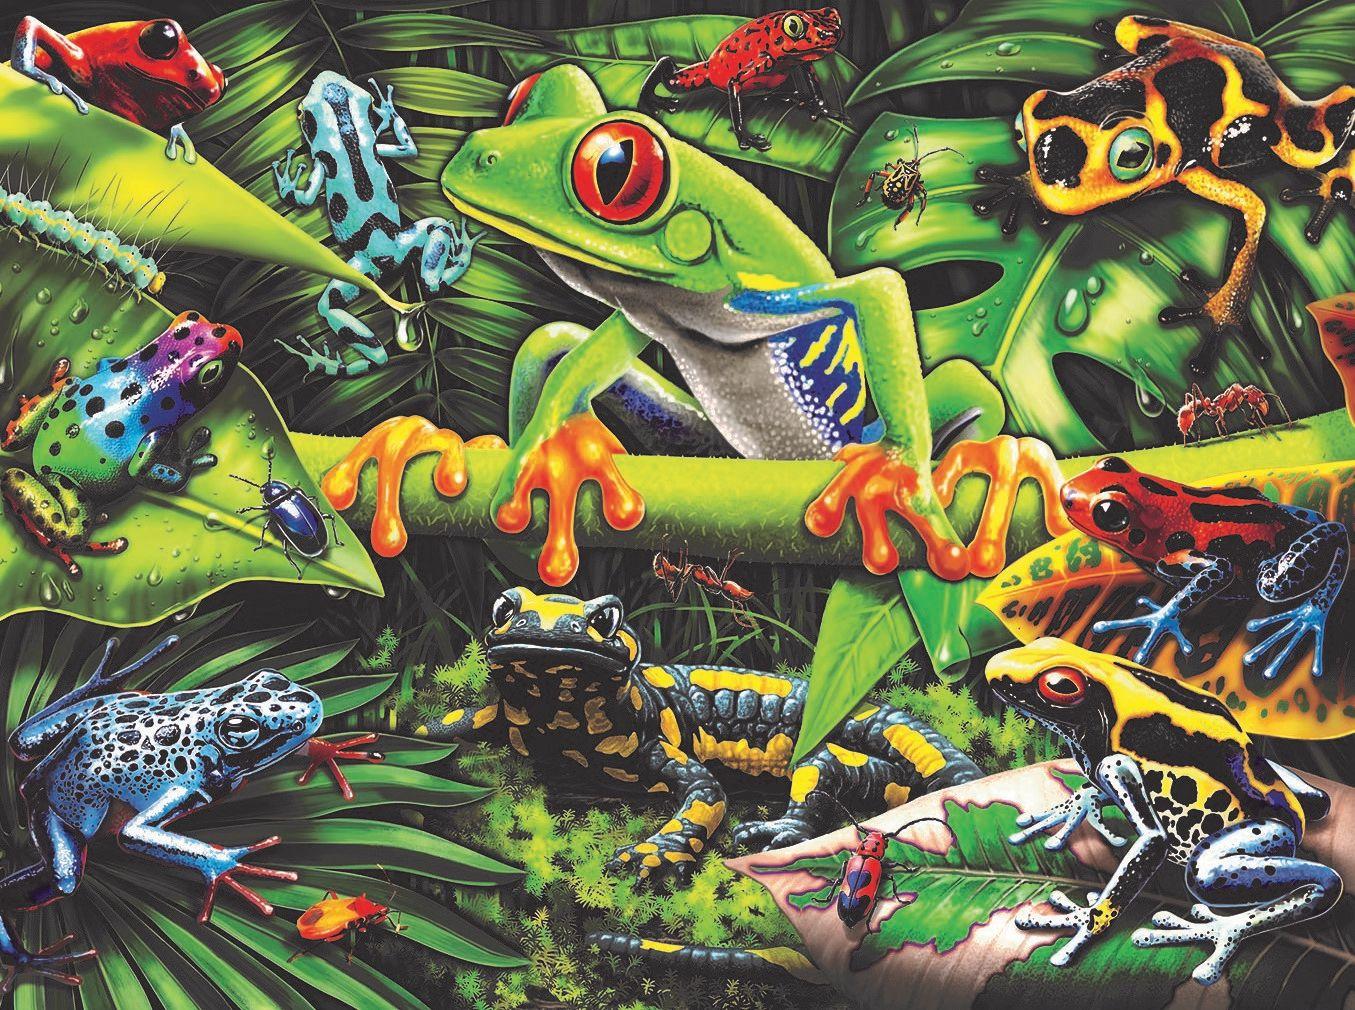 Amazing Amphibians Reptiles / Amphibians Jigsaw Puzzle